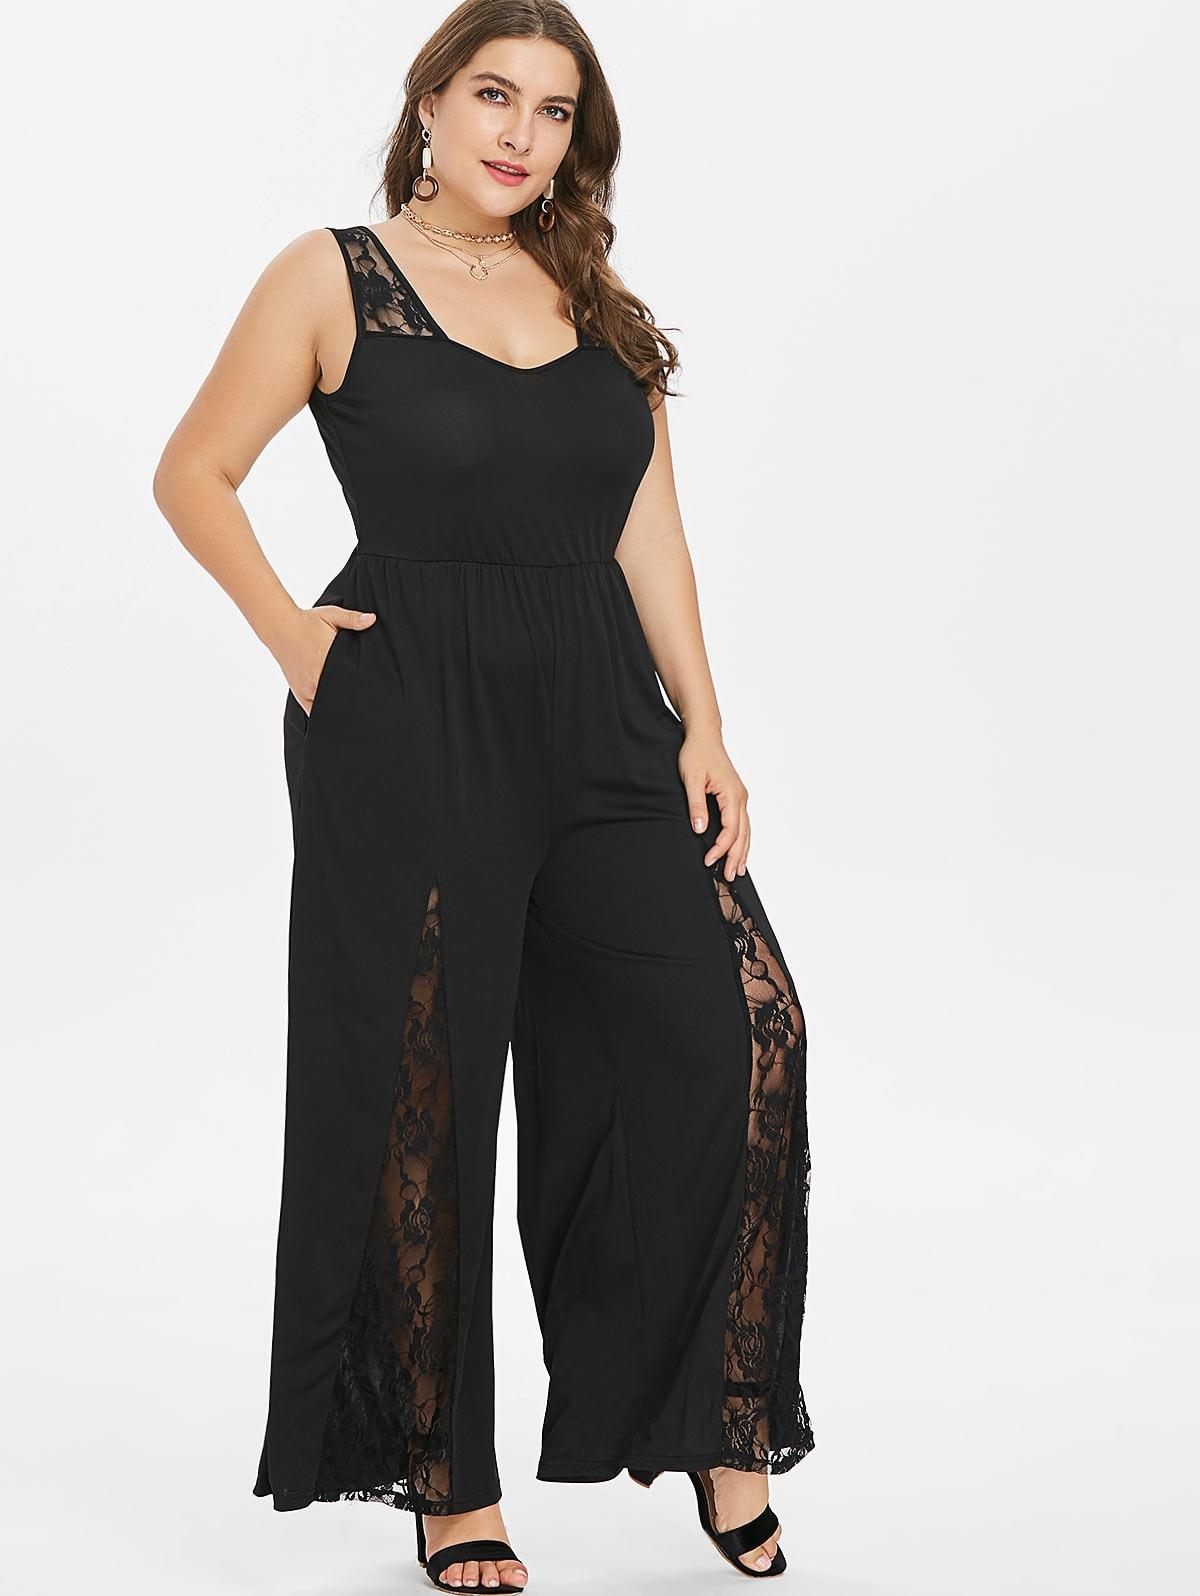 Wipalo Women Plus Size 5XL Lace Panel Wide Leg Jumpsuit Casual Solid Plunging Neck Sleeveless Floor Length Jumpsuit Big Size Set